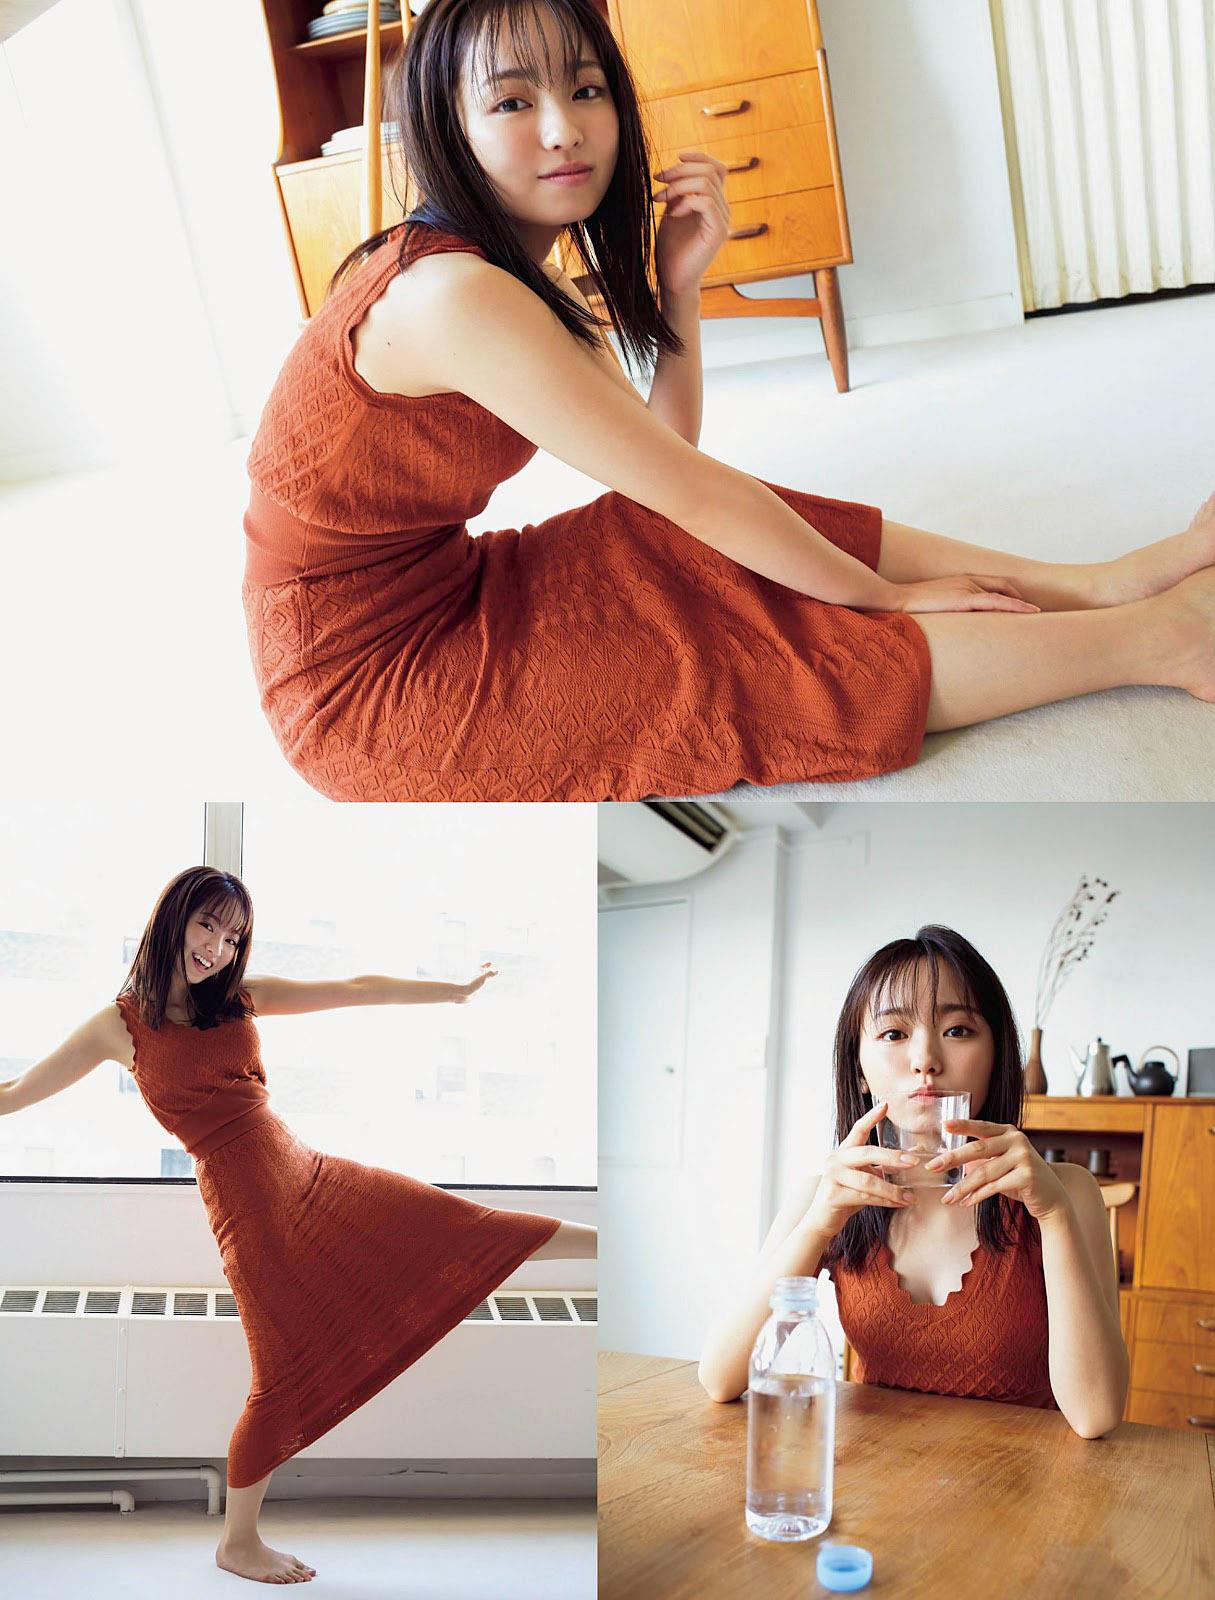 Yui Imaizumi Flash 191105 04.jpg